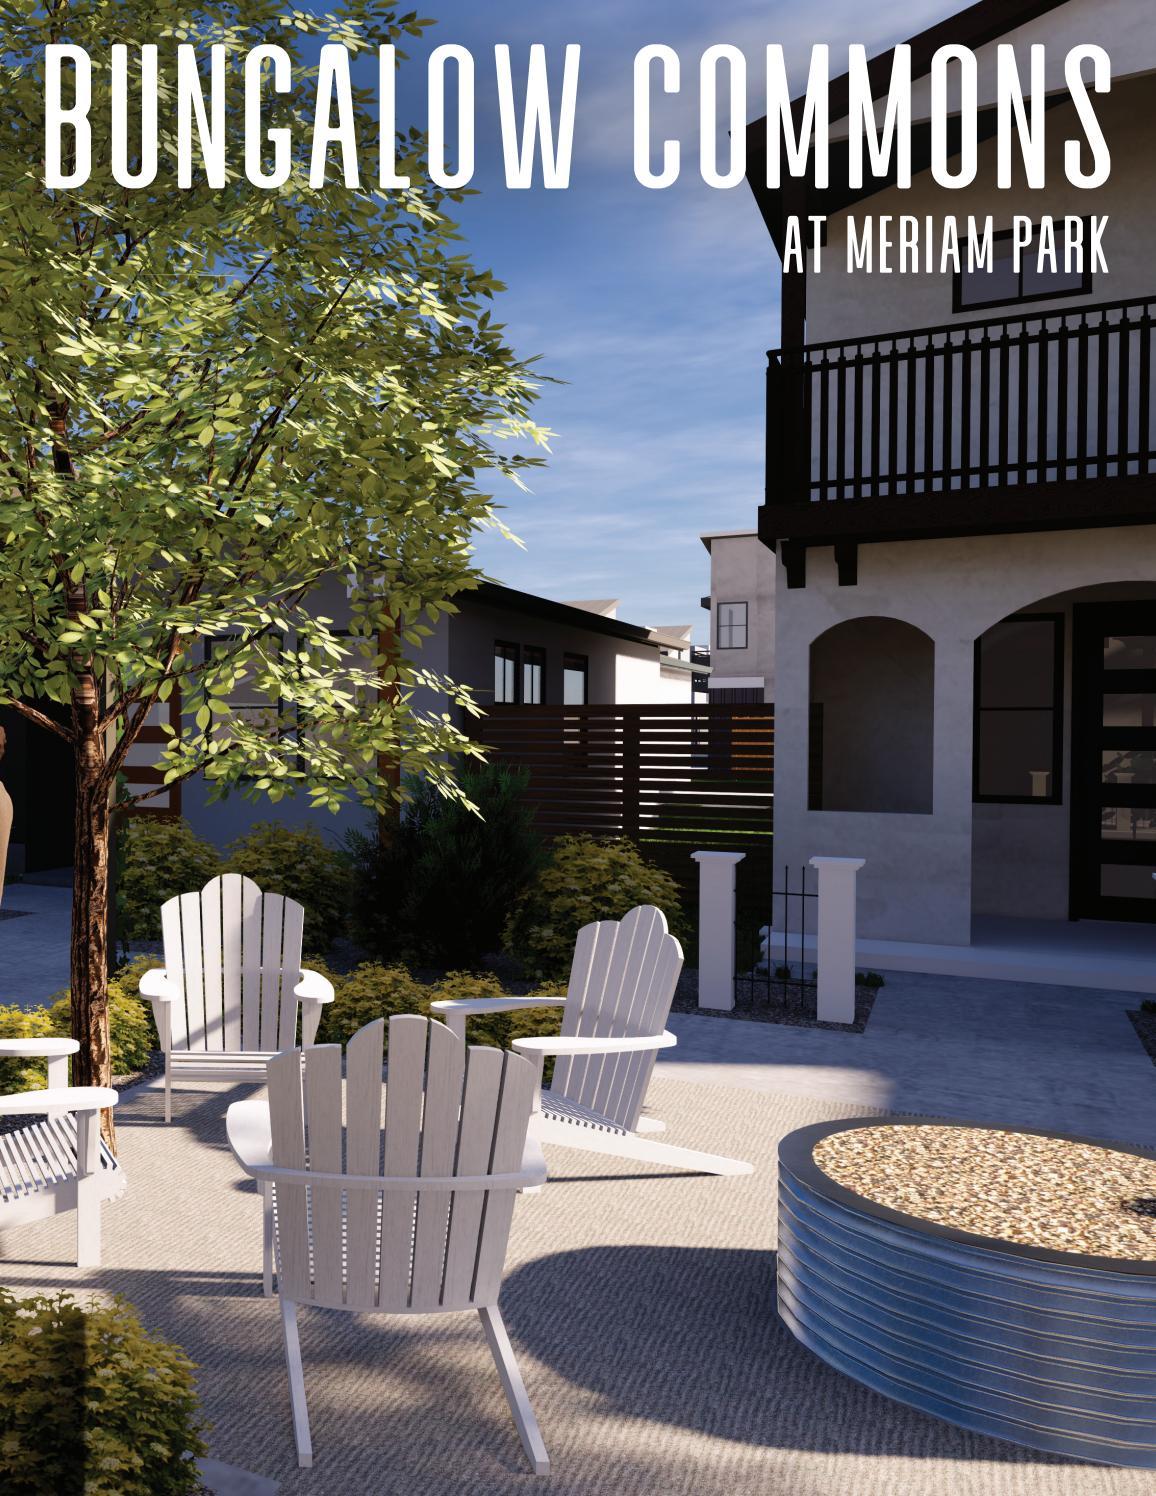 Bungalow Commons Single Family Housing Development Meriam Park Chico Ca By Gonzales Development Company Issuu